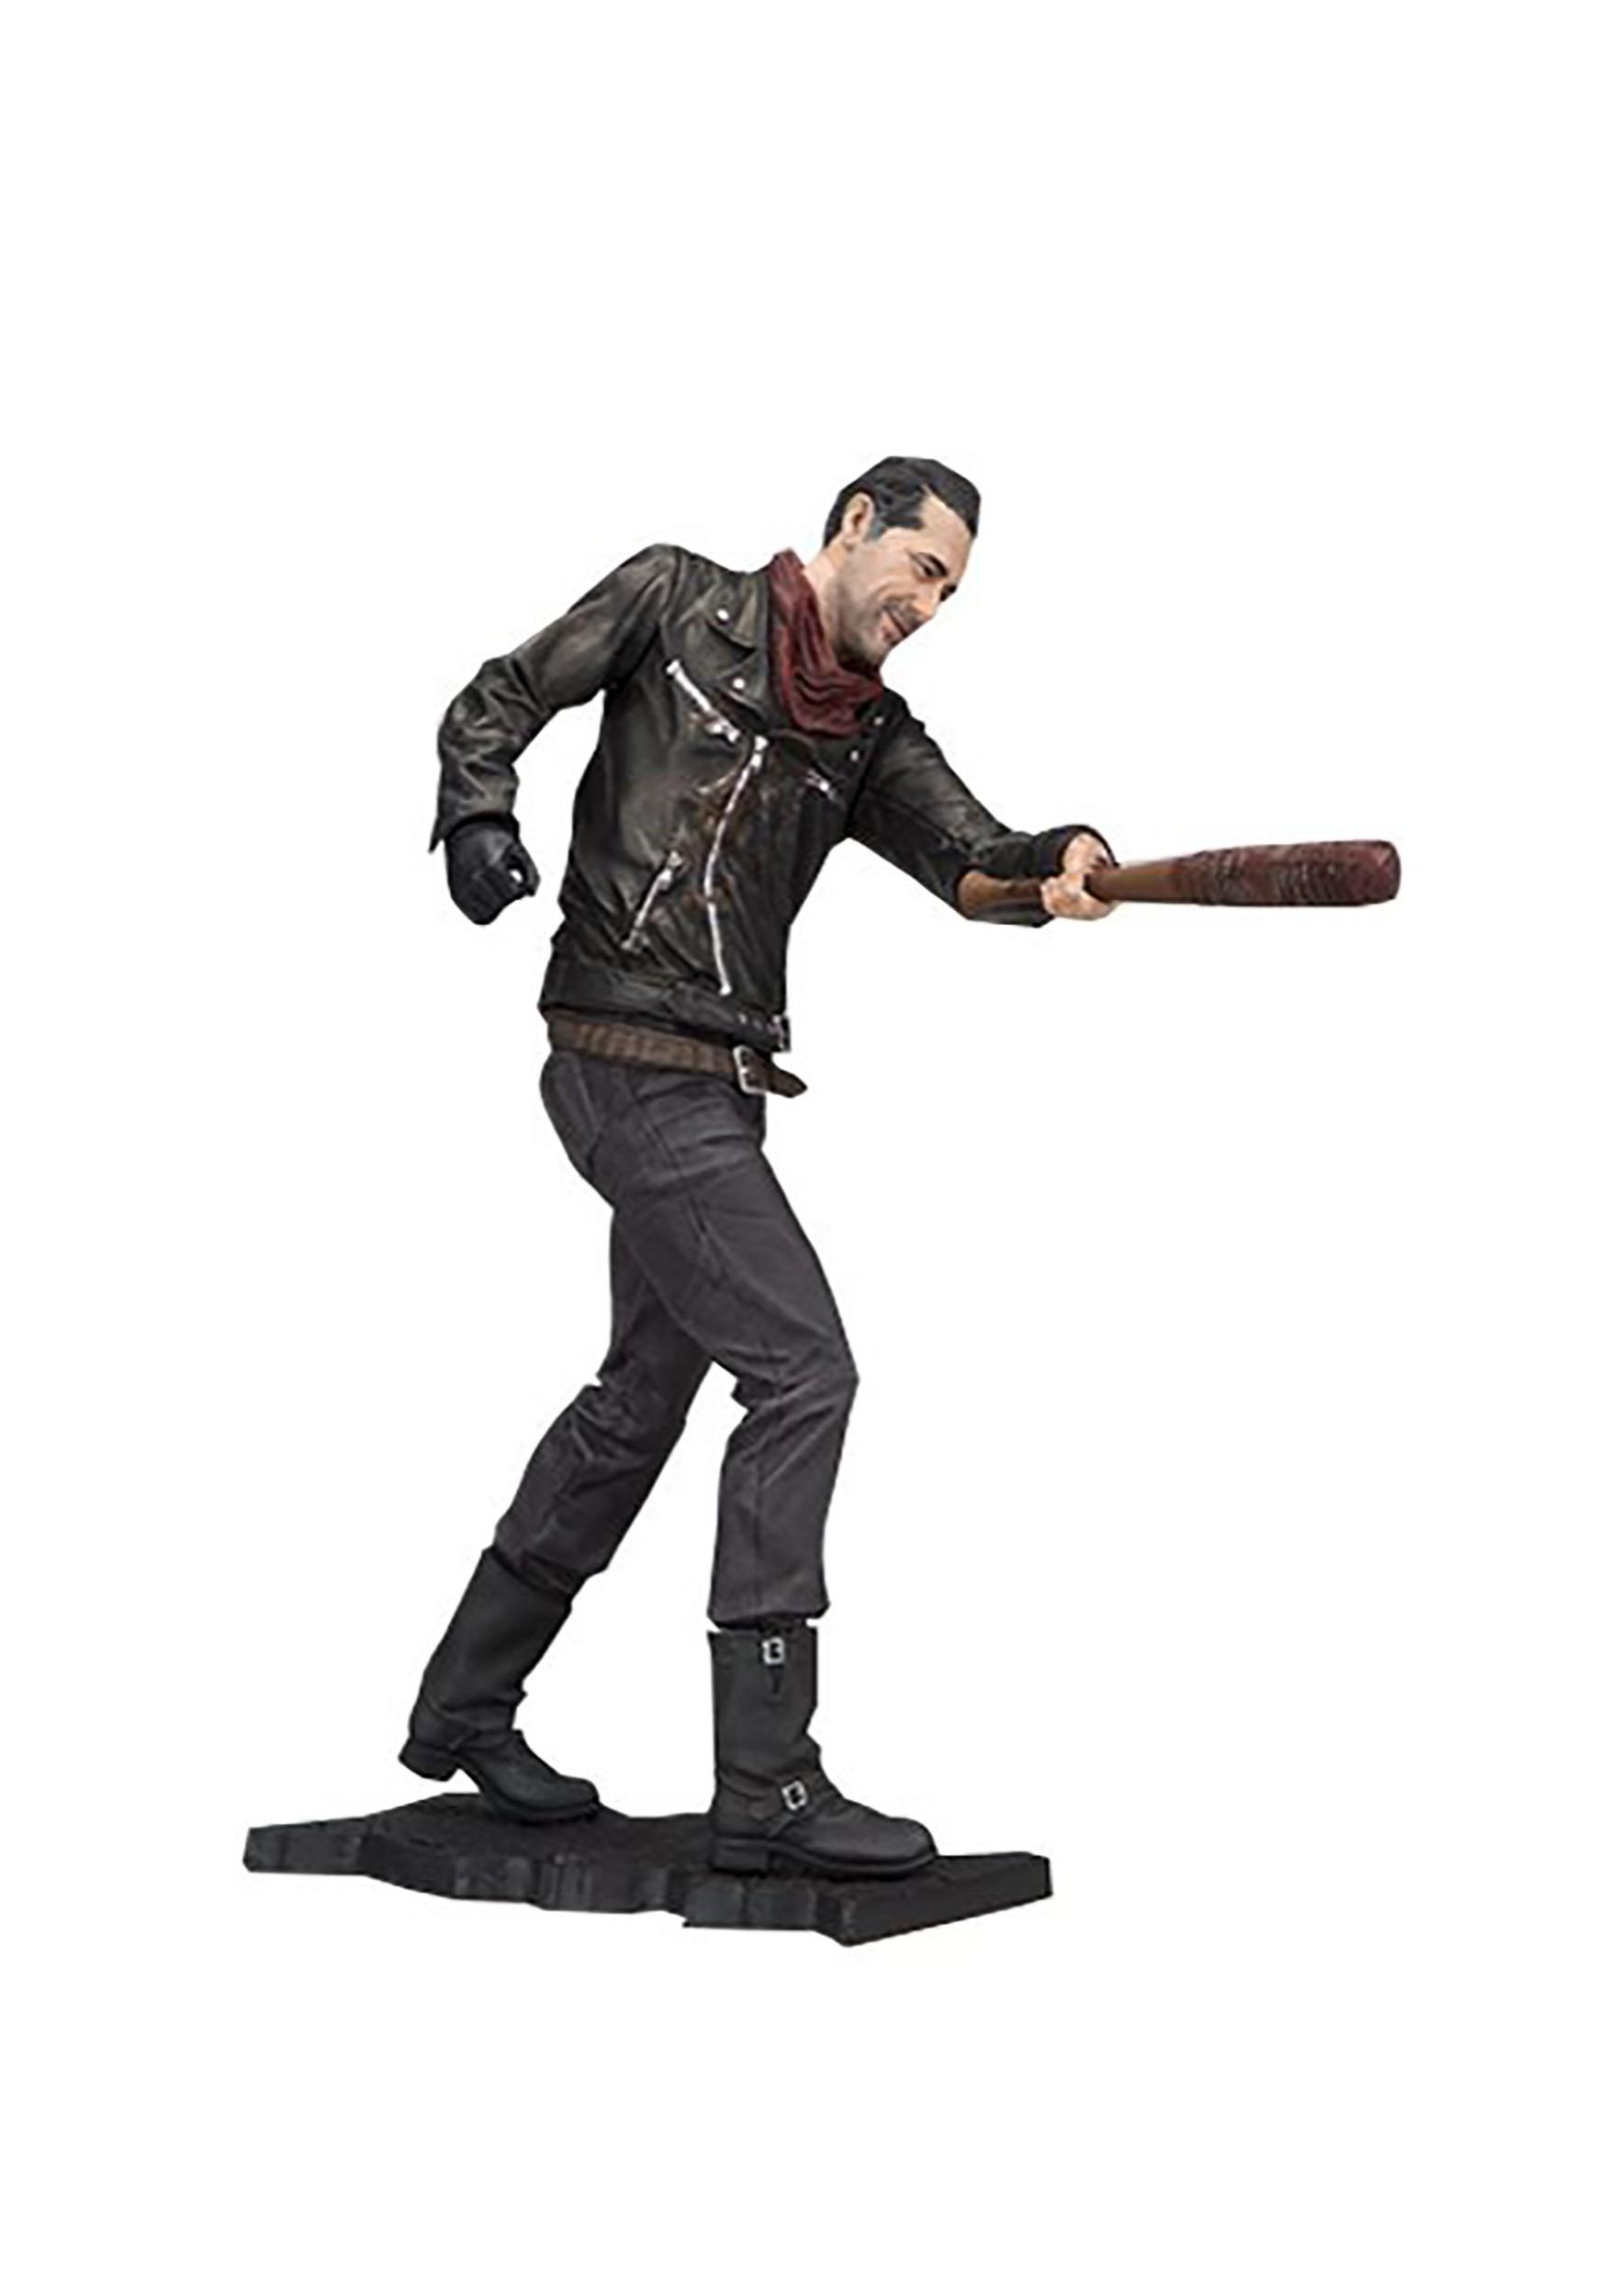 Walking Dead Deluxe Negan Merciless Edition 10-Inch Figure